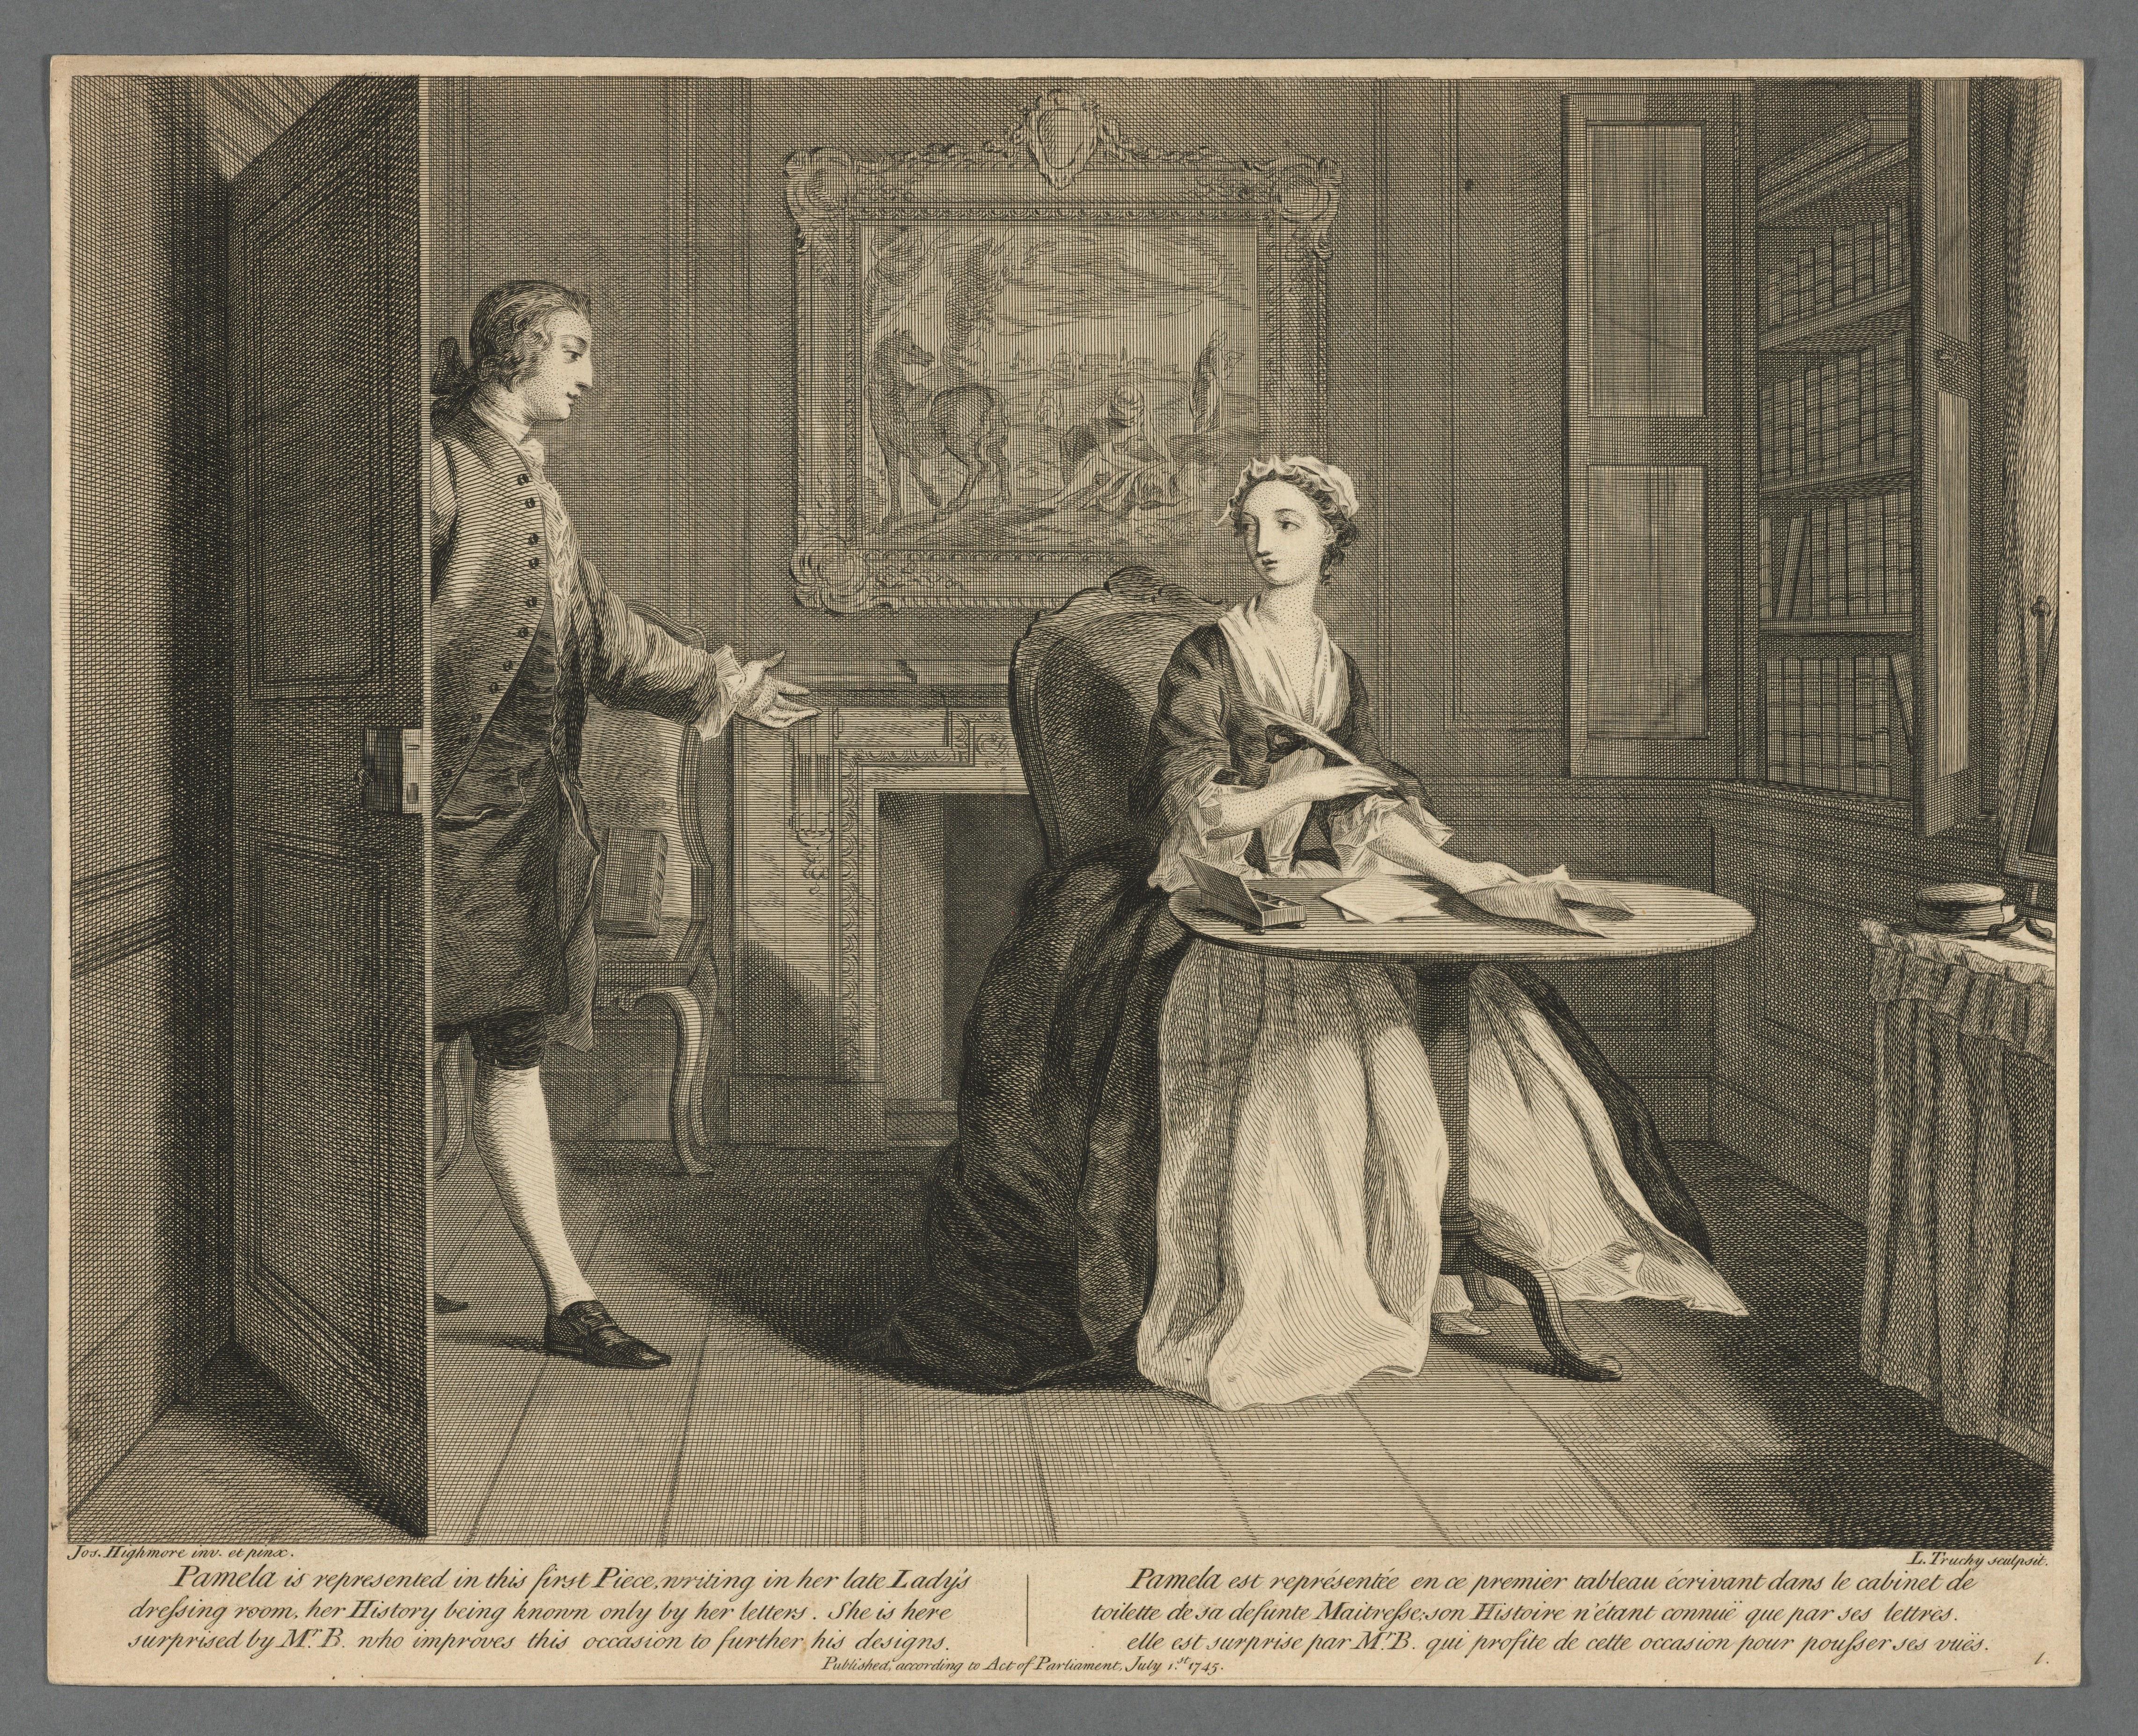 File:Houghton Typ 705.45.452 - Pamela, 1745, plate 1.jpg